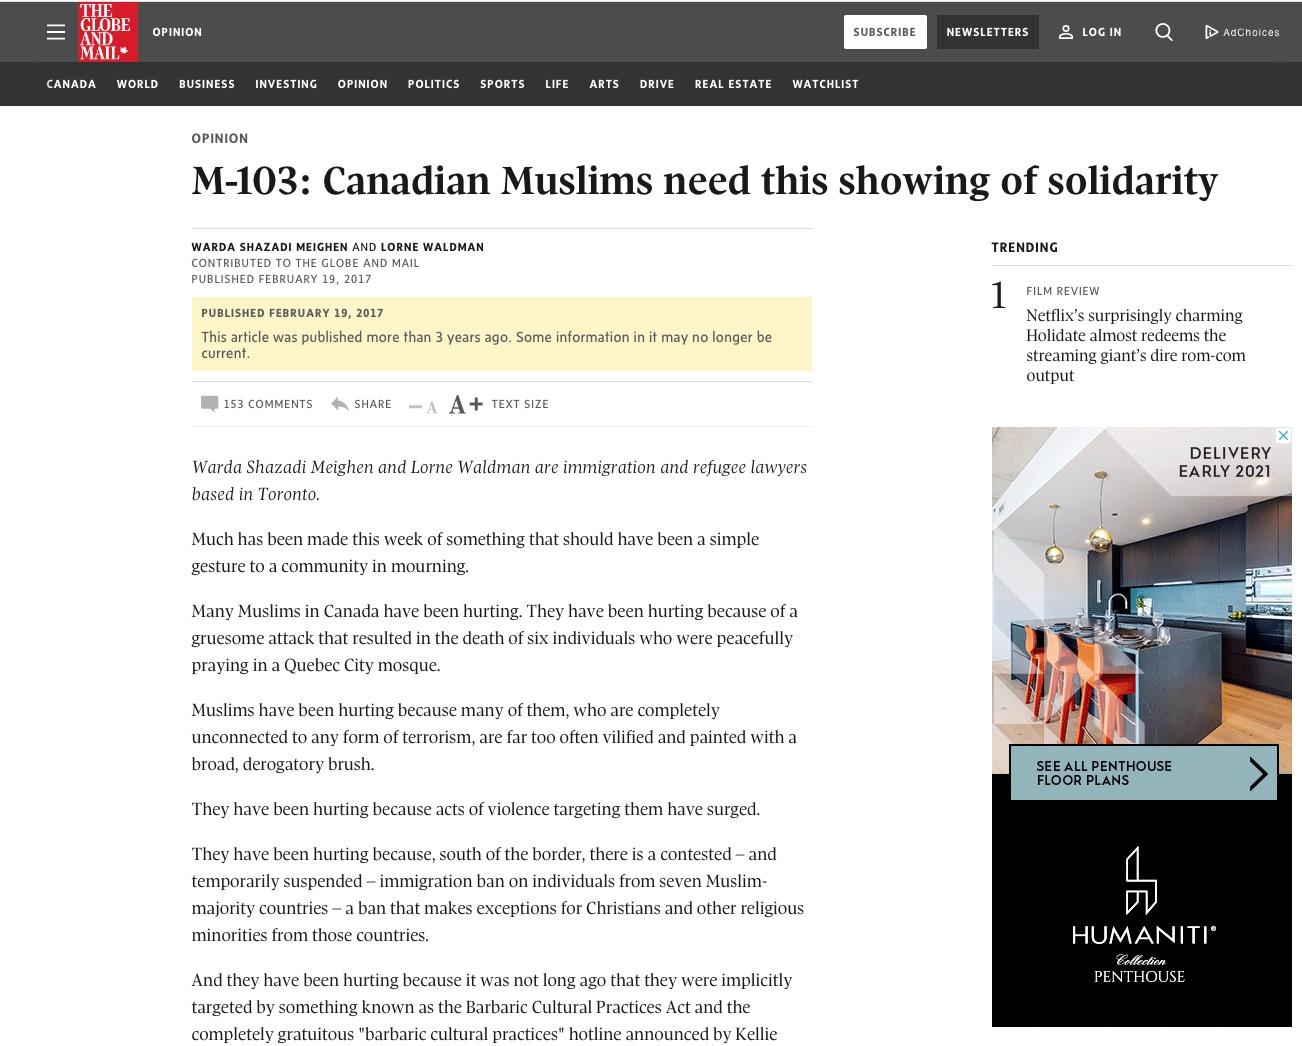 Warda Shazadi Meighen – M-103: Canadian Muslims need this showing of solidarity